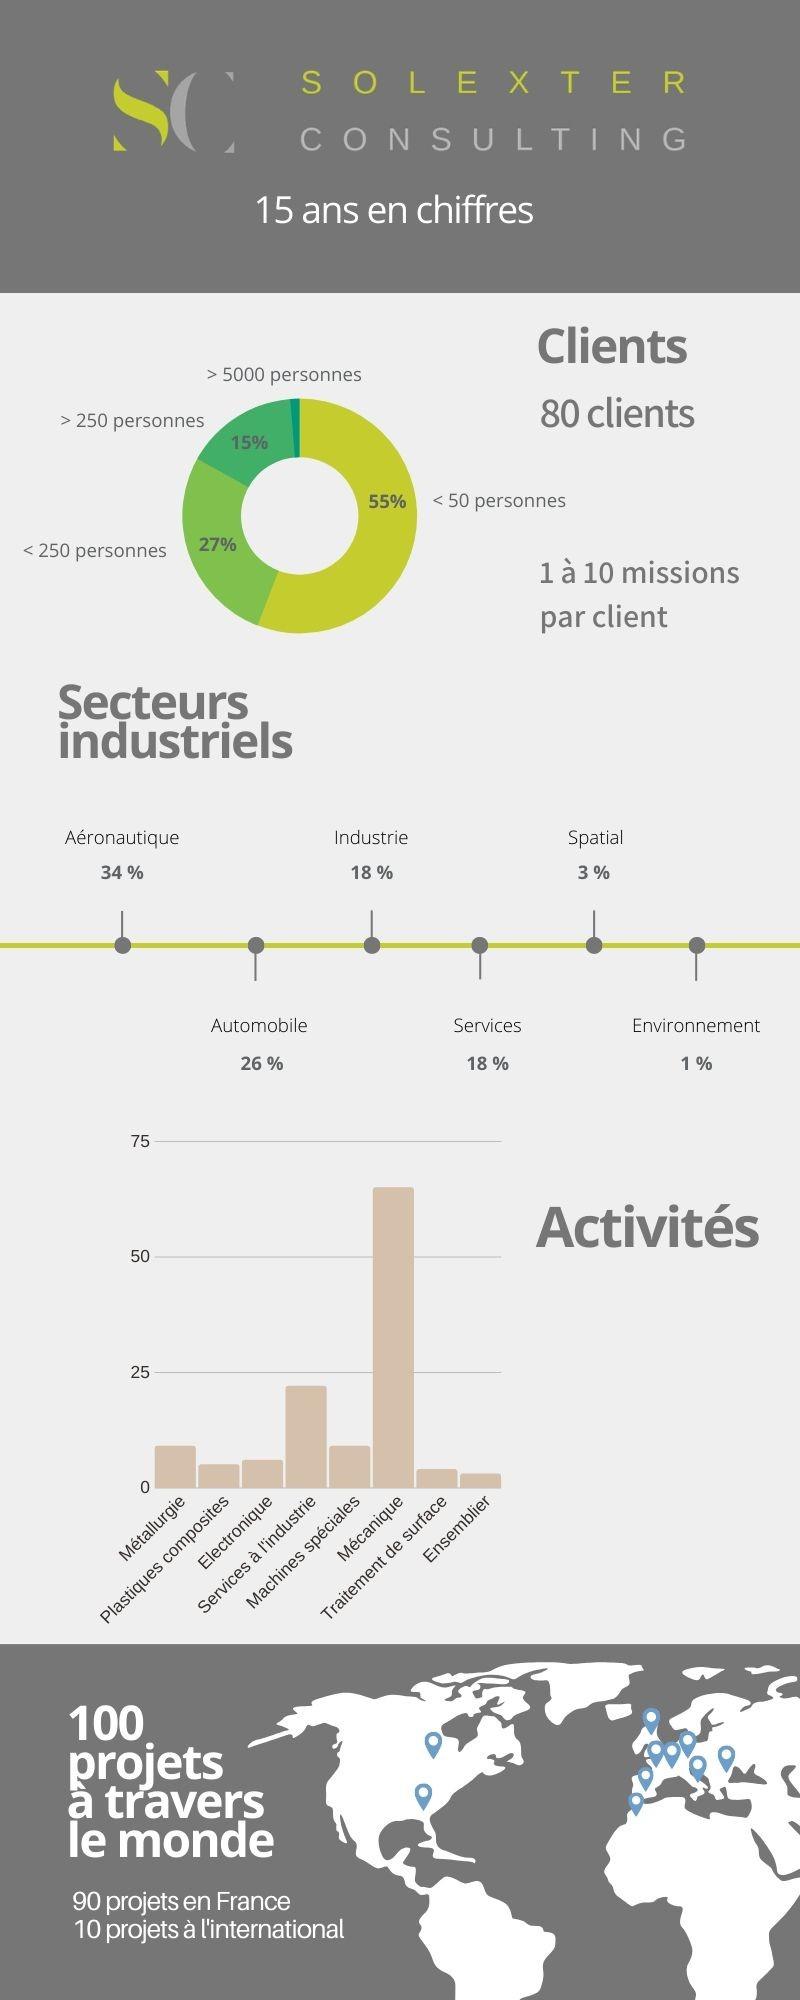 Infographie Solexter - 15 ans